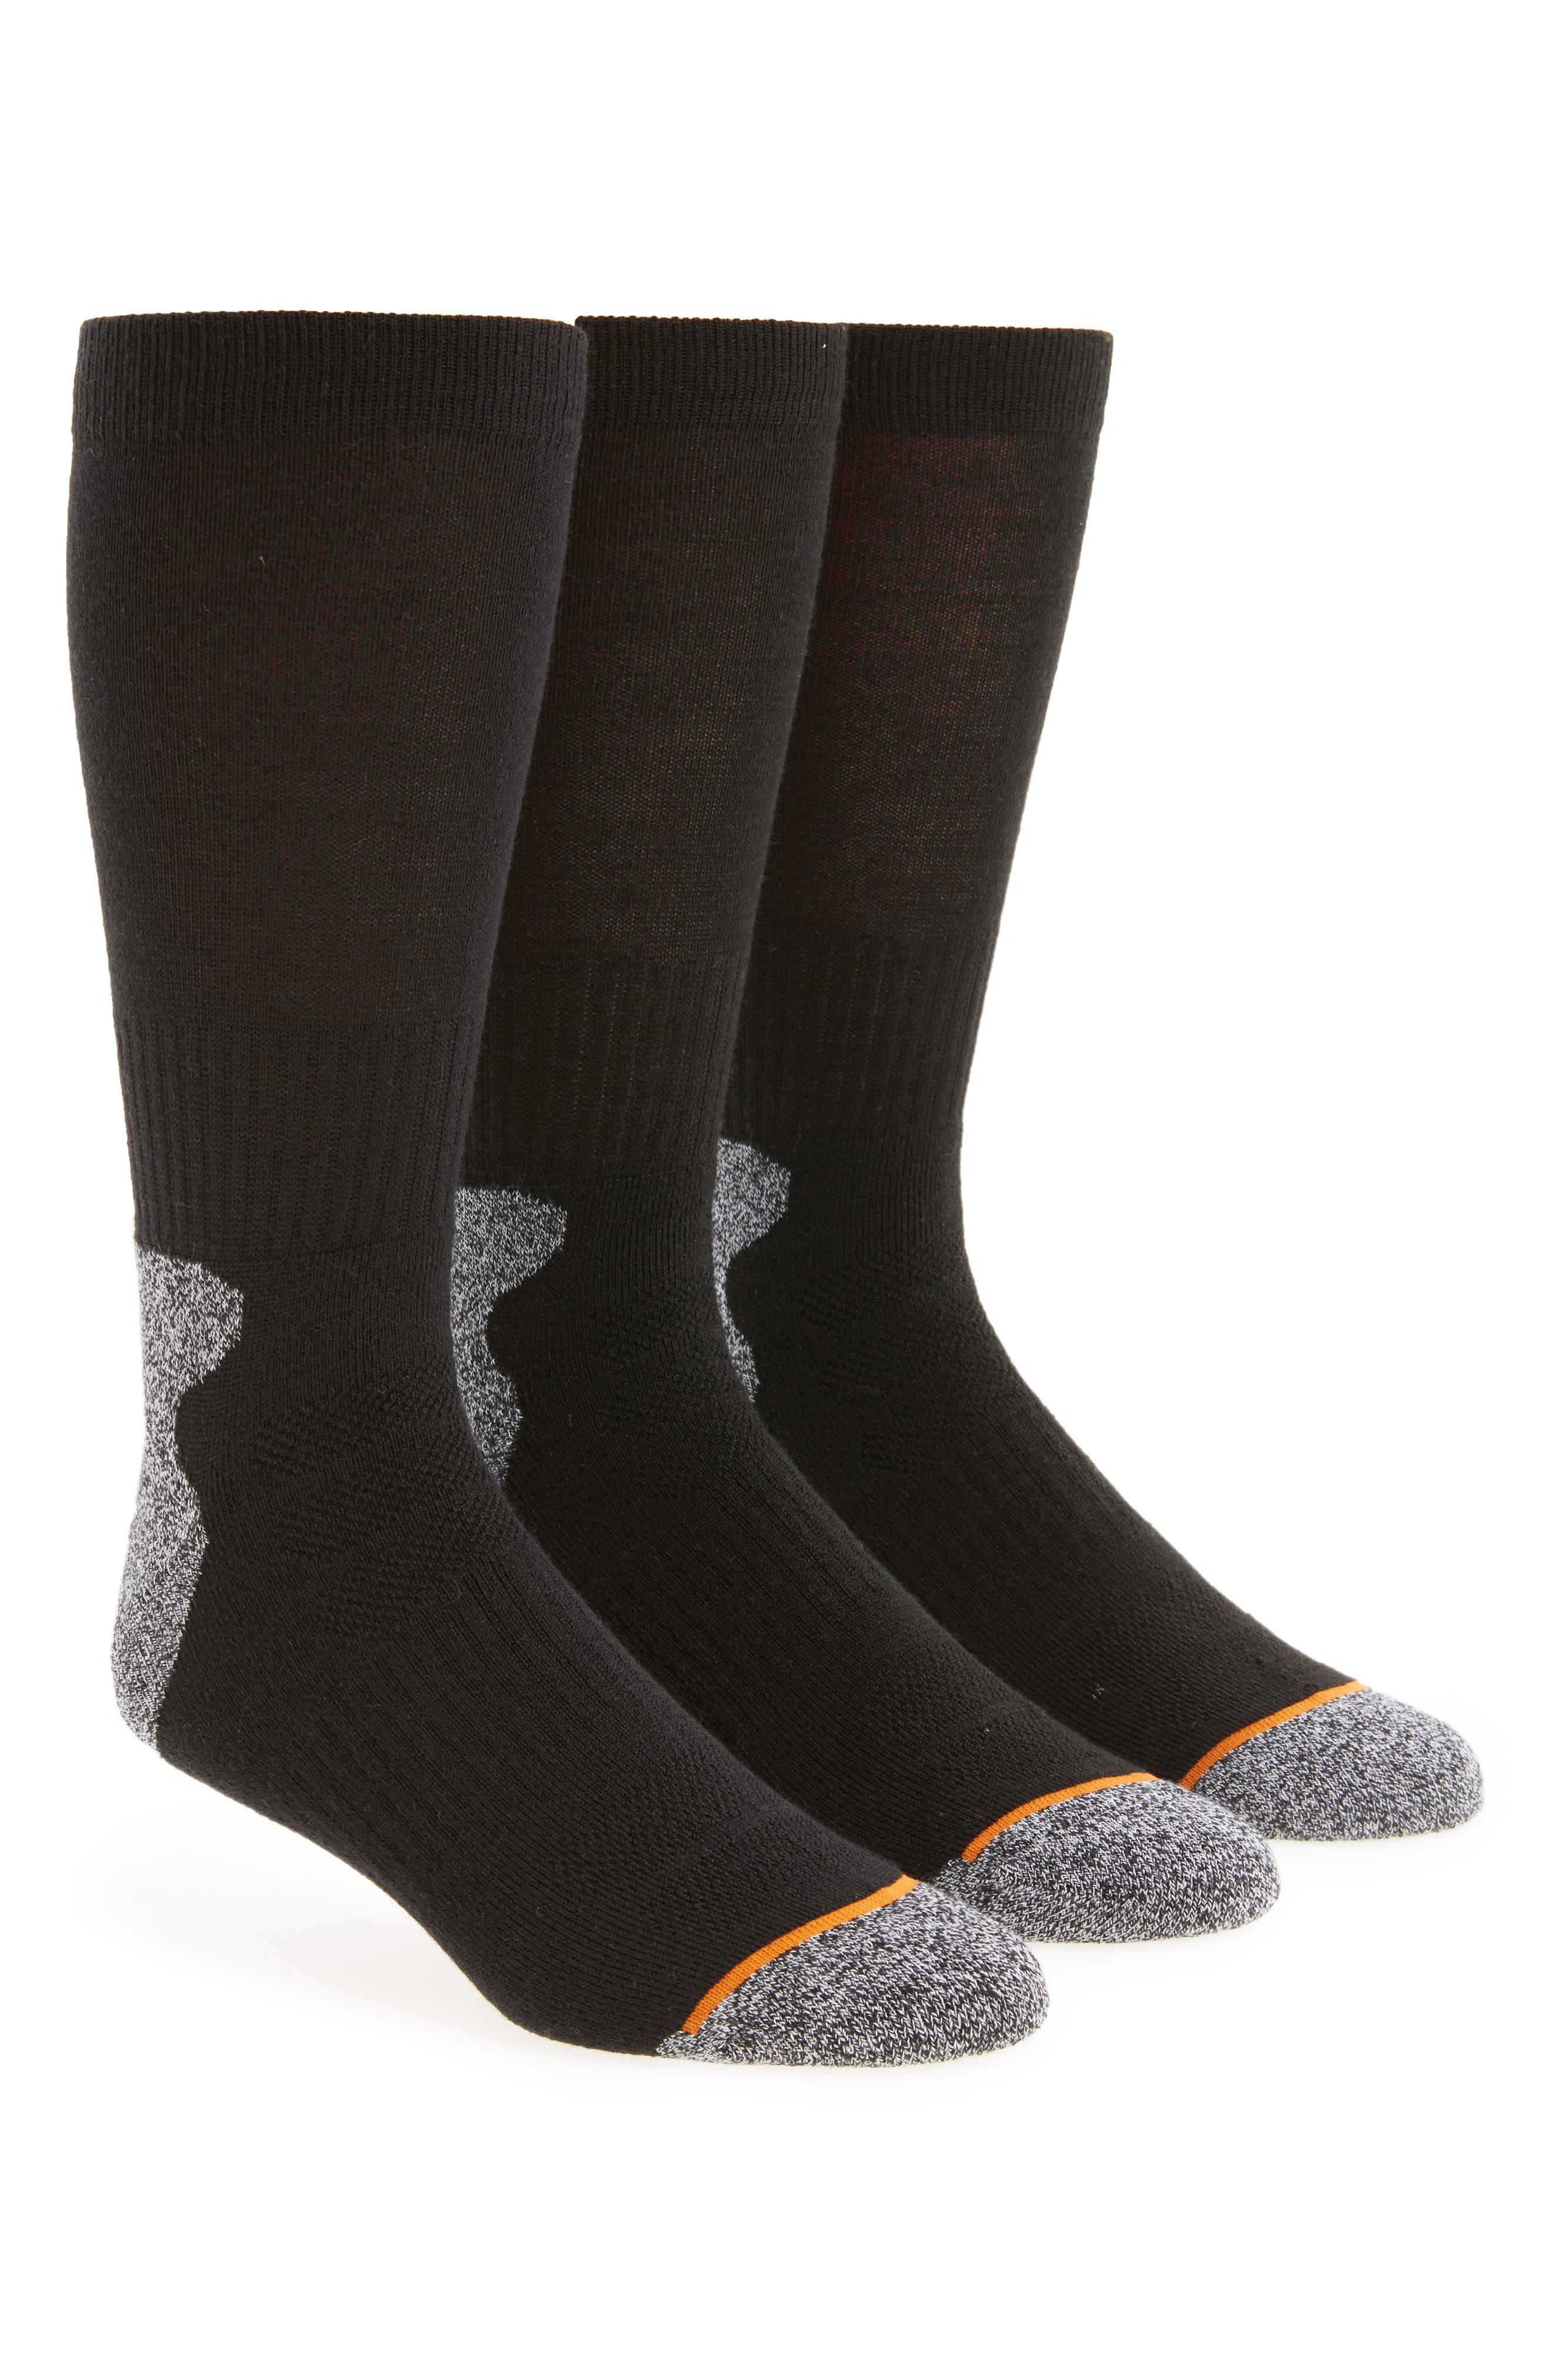 3-Pack Assorted Boot Socks,                             Main thumbnail 1, color,